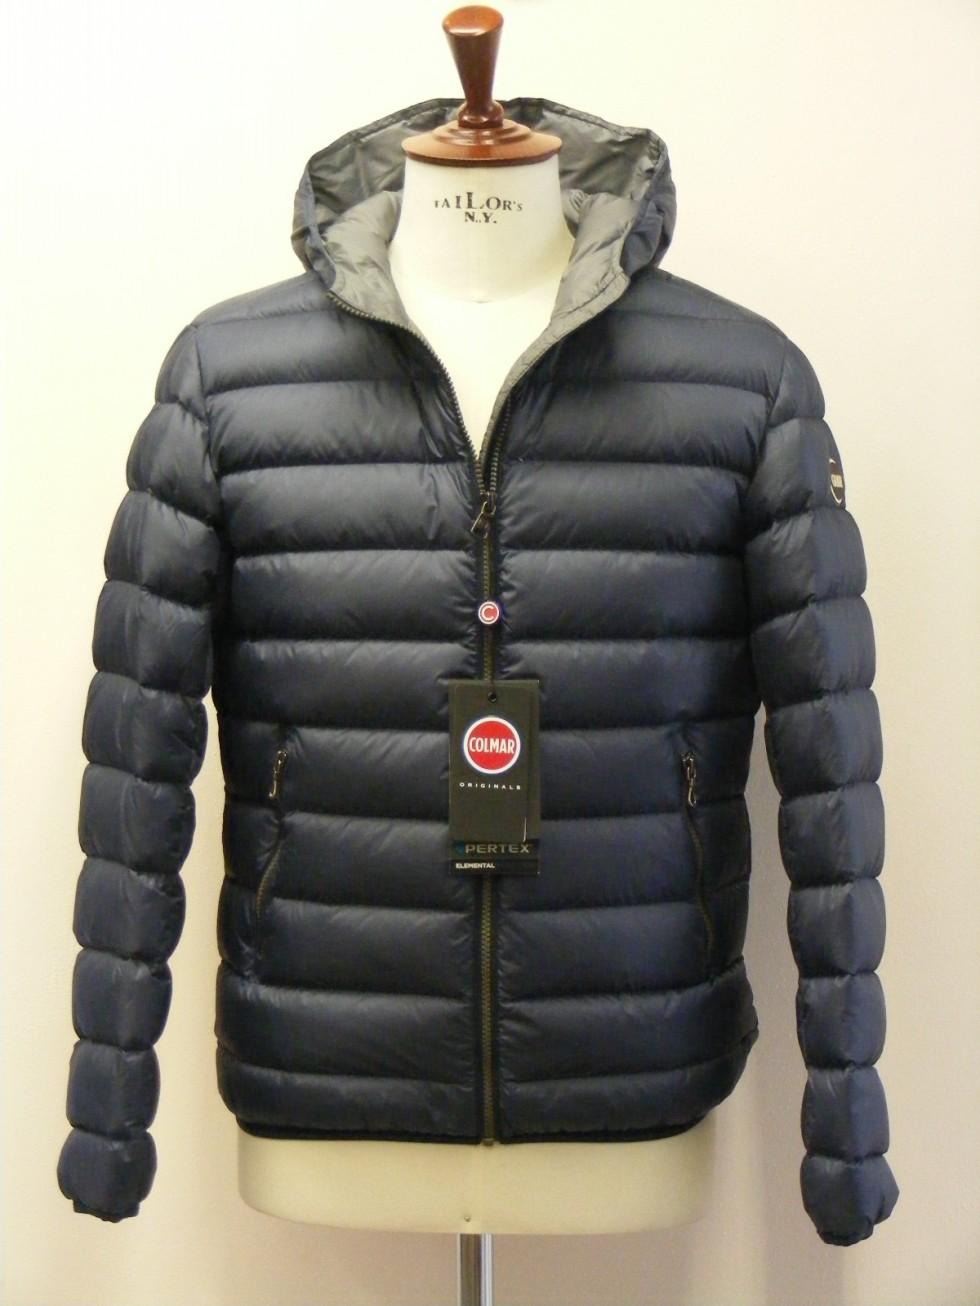 Indovina Quadrante ambiente  PIUMINO COLMAR ORIGINALS UOMO 1249 5ST COL.68 | Vendita Abbigliamento